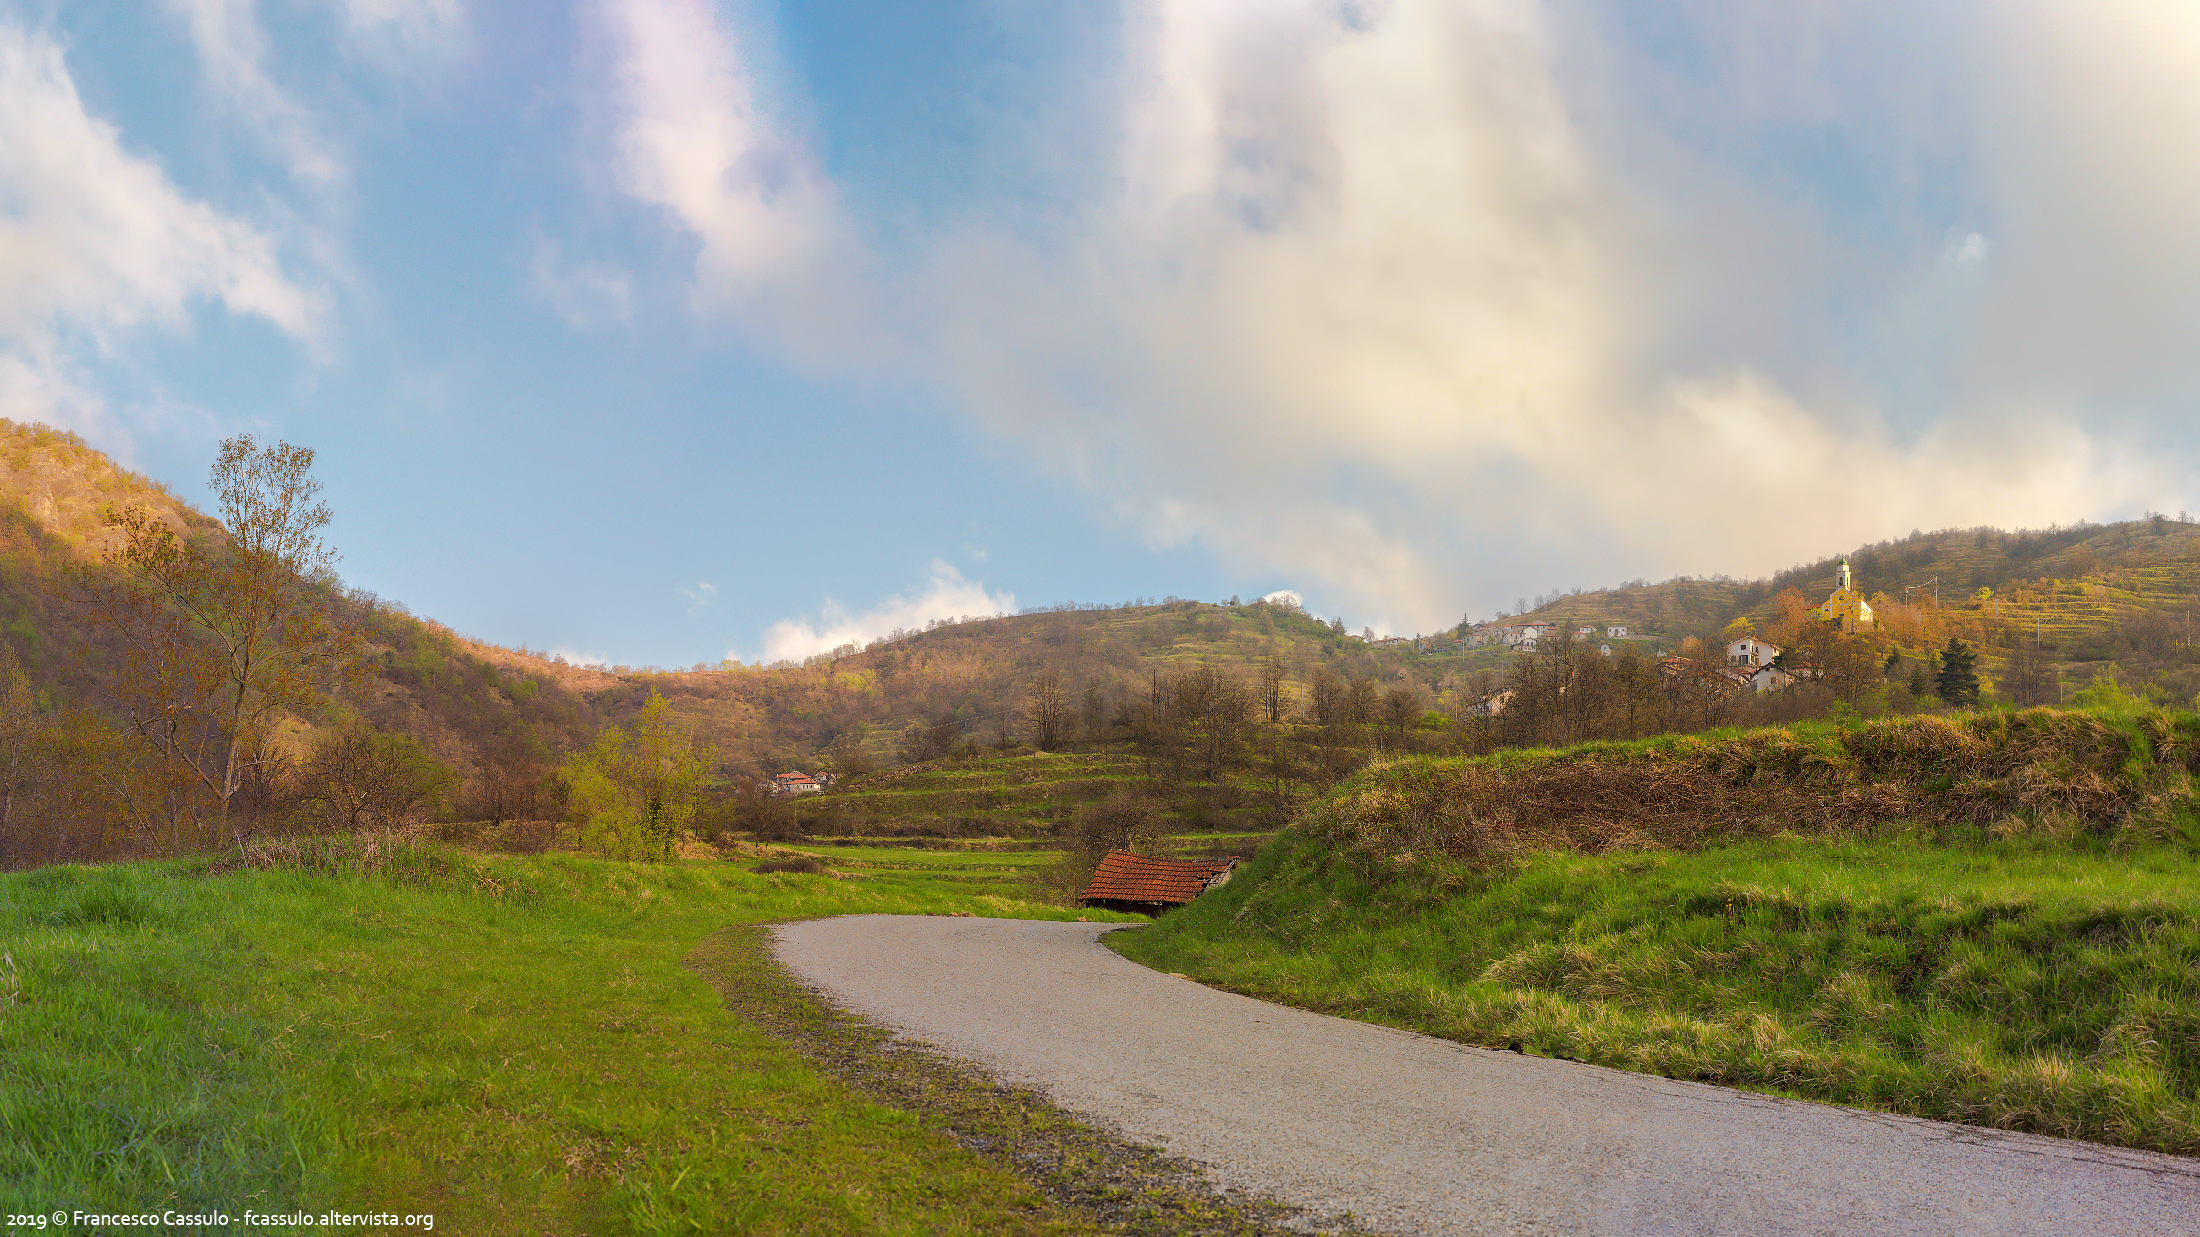 Alta Val Vobbia, Salted, Casareggio and Caprieto...